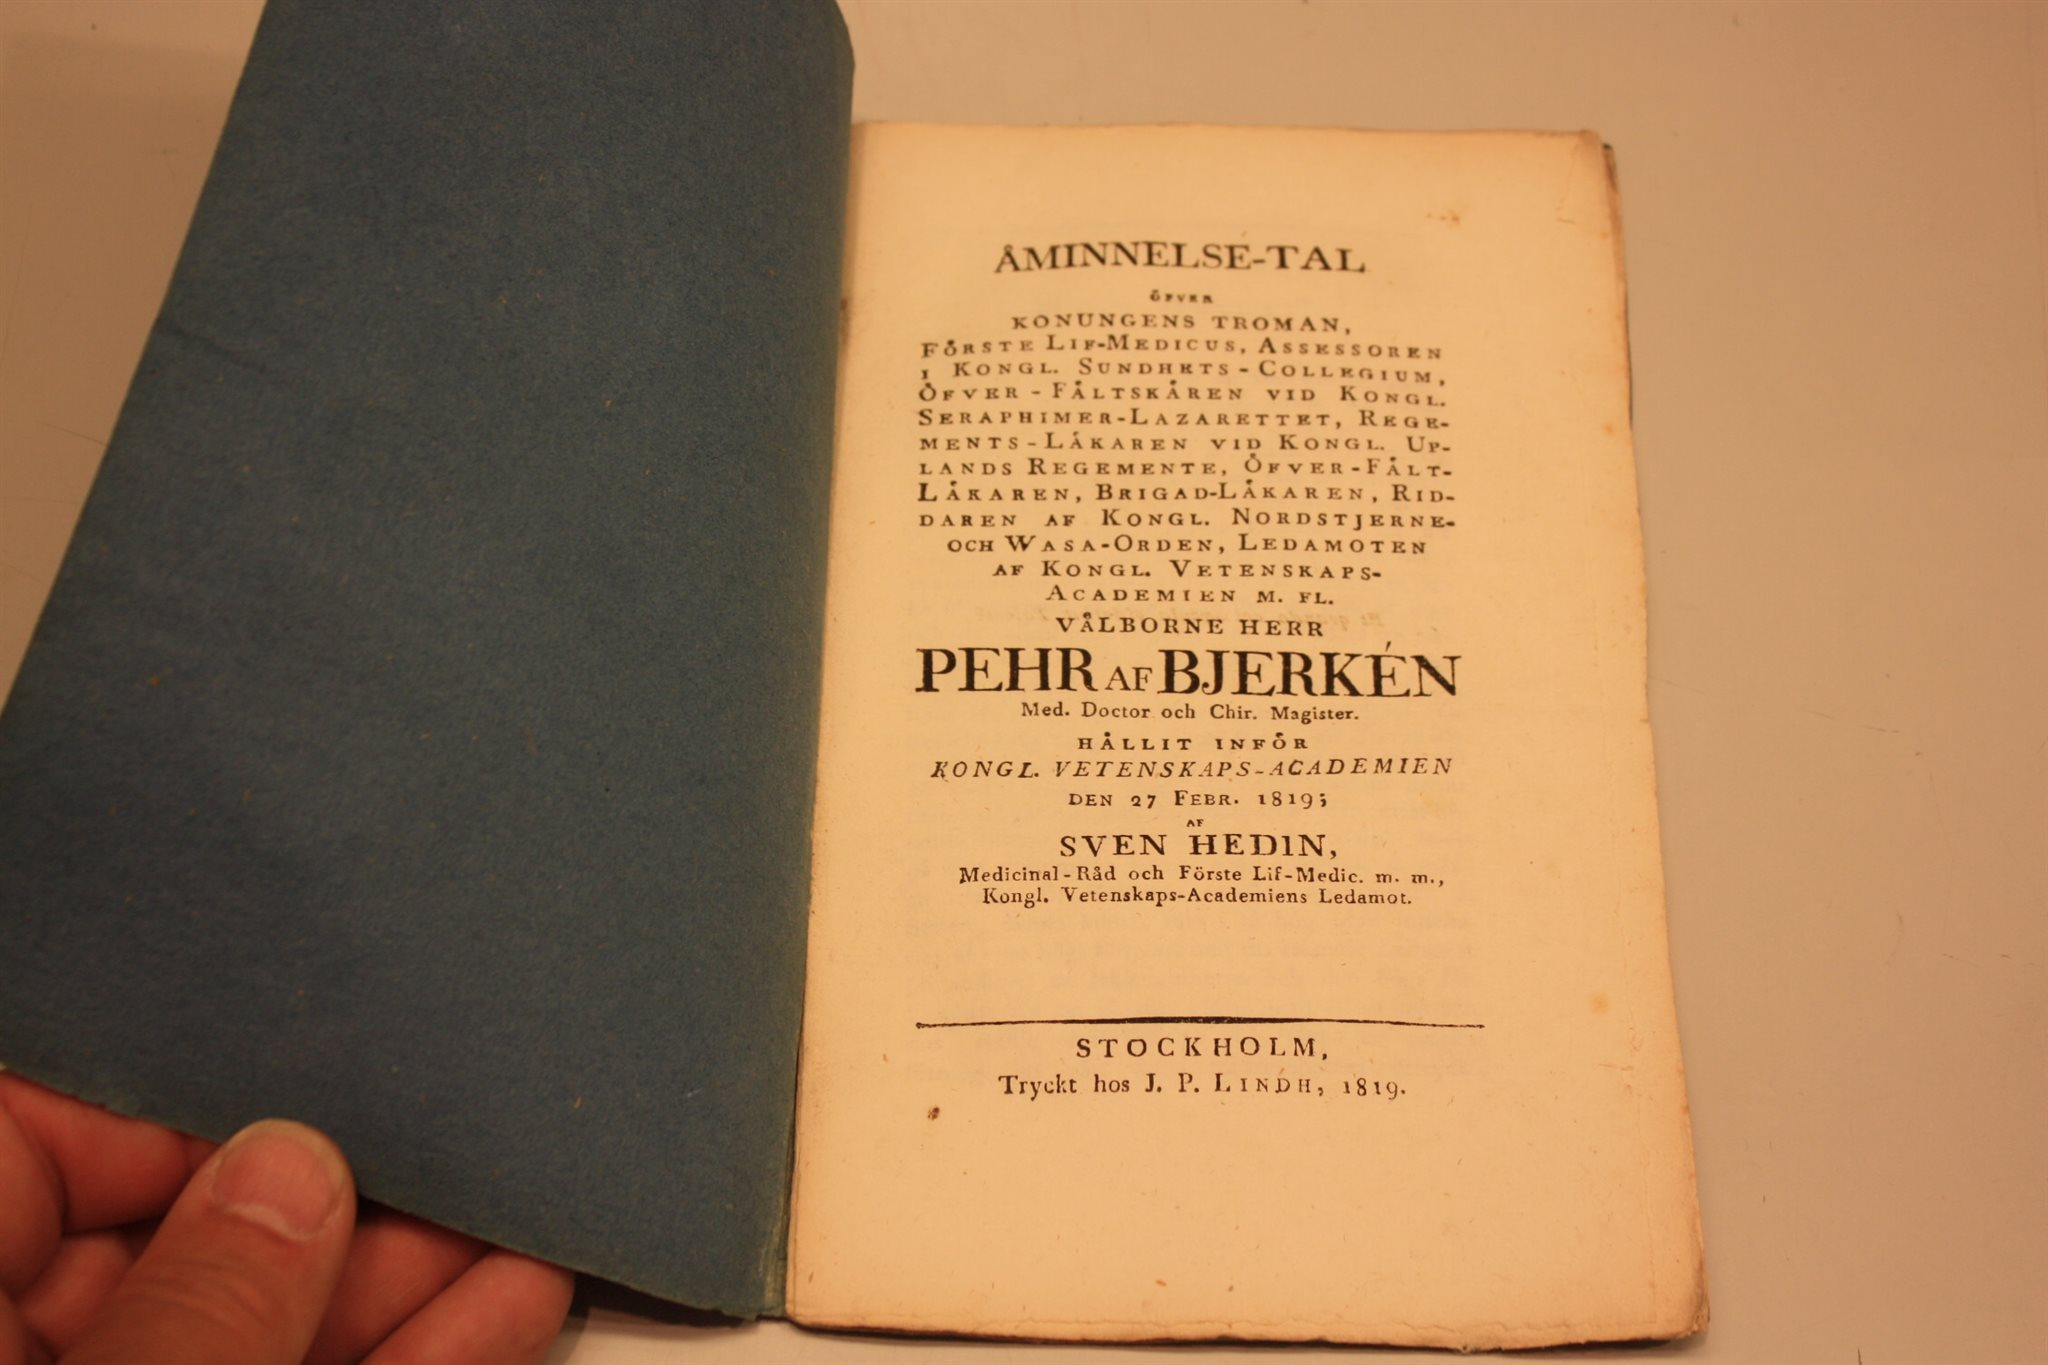 Åminnelsetal hållet i vetenskapsacademien 1819